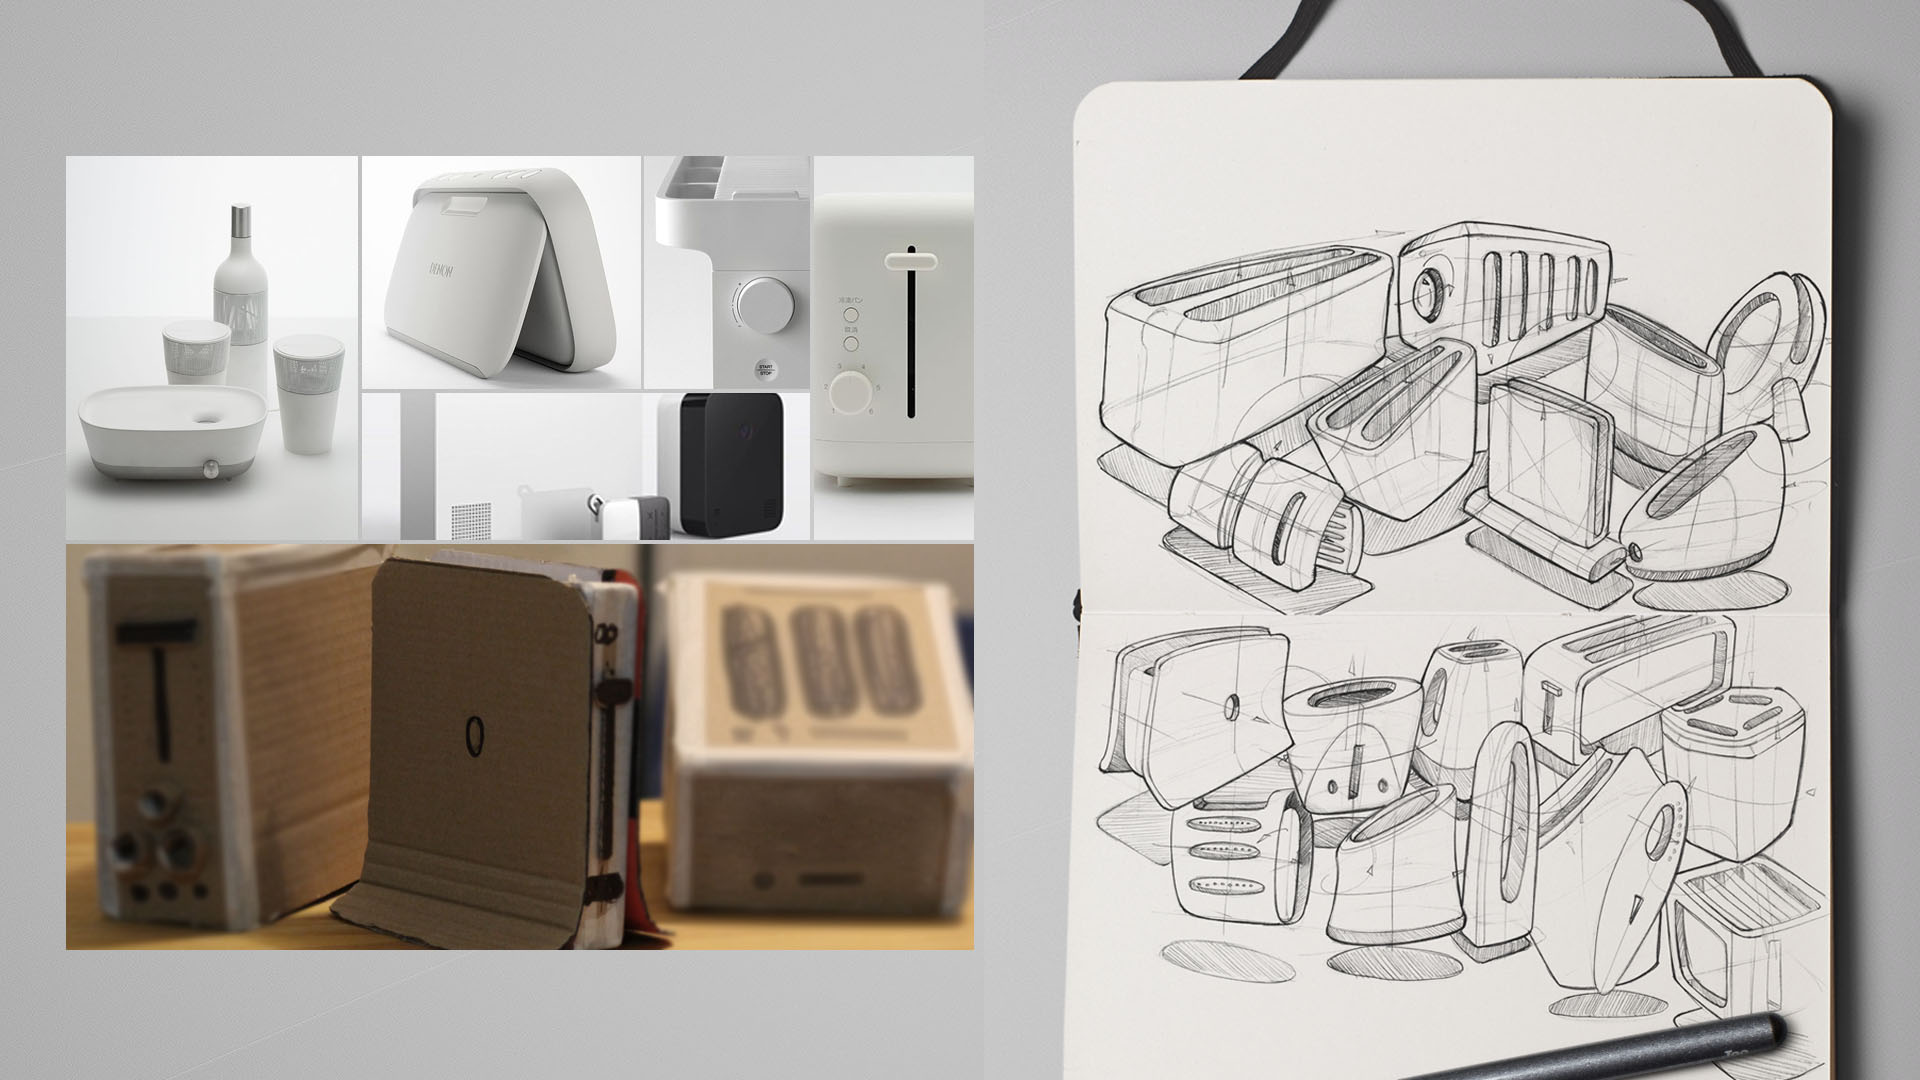 Toaster2bWebsite.jpg